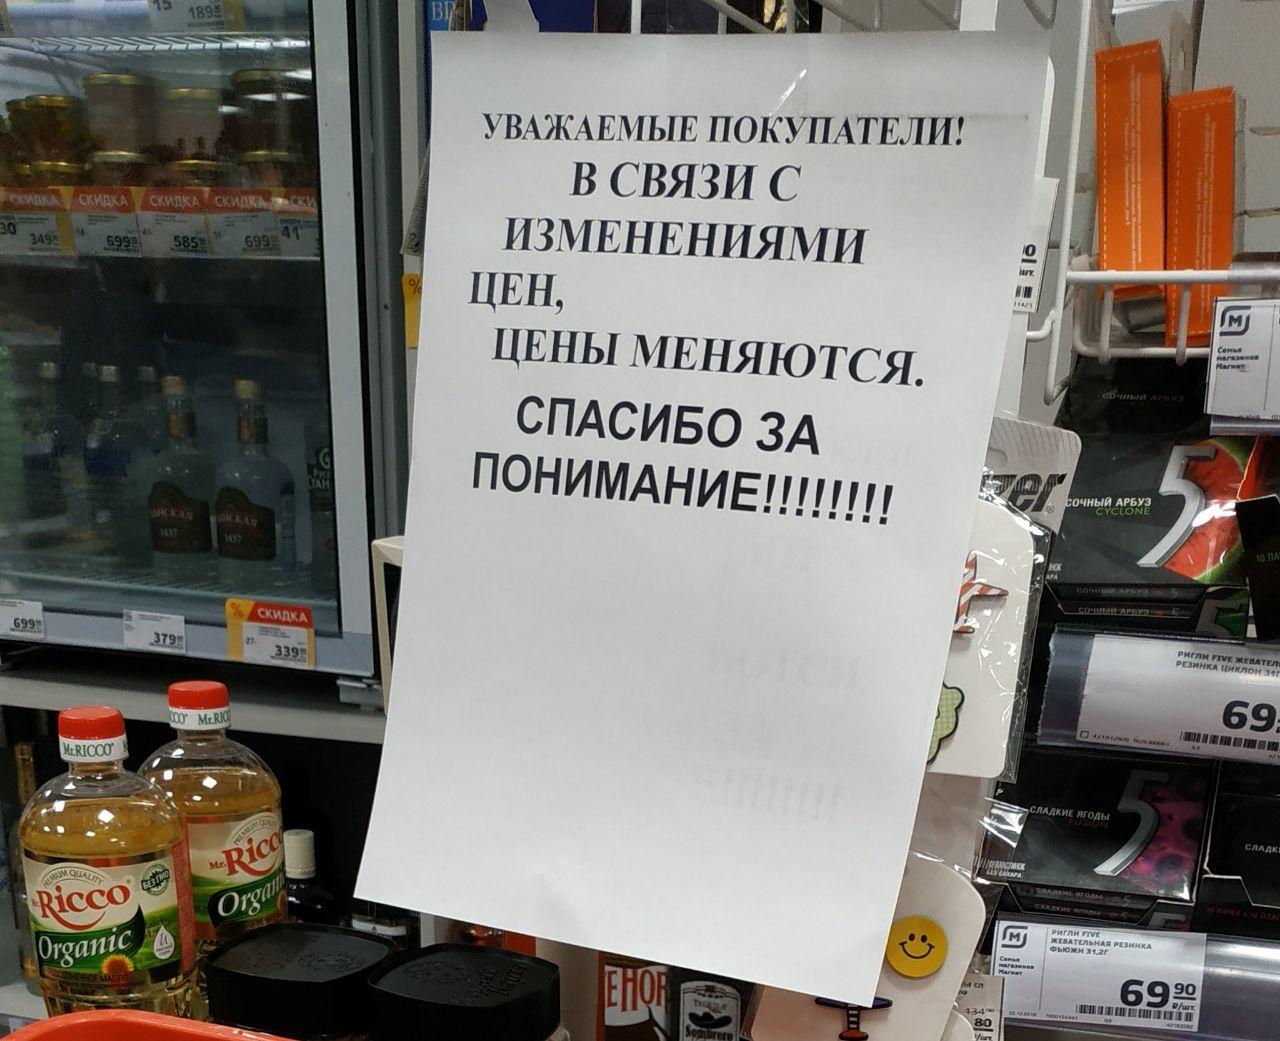 https://cs11.pikabu.ru/post_img/big/2020/01/23/6/157976668517304972.png